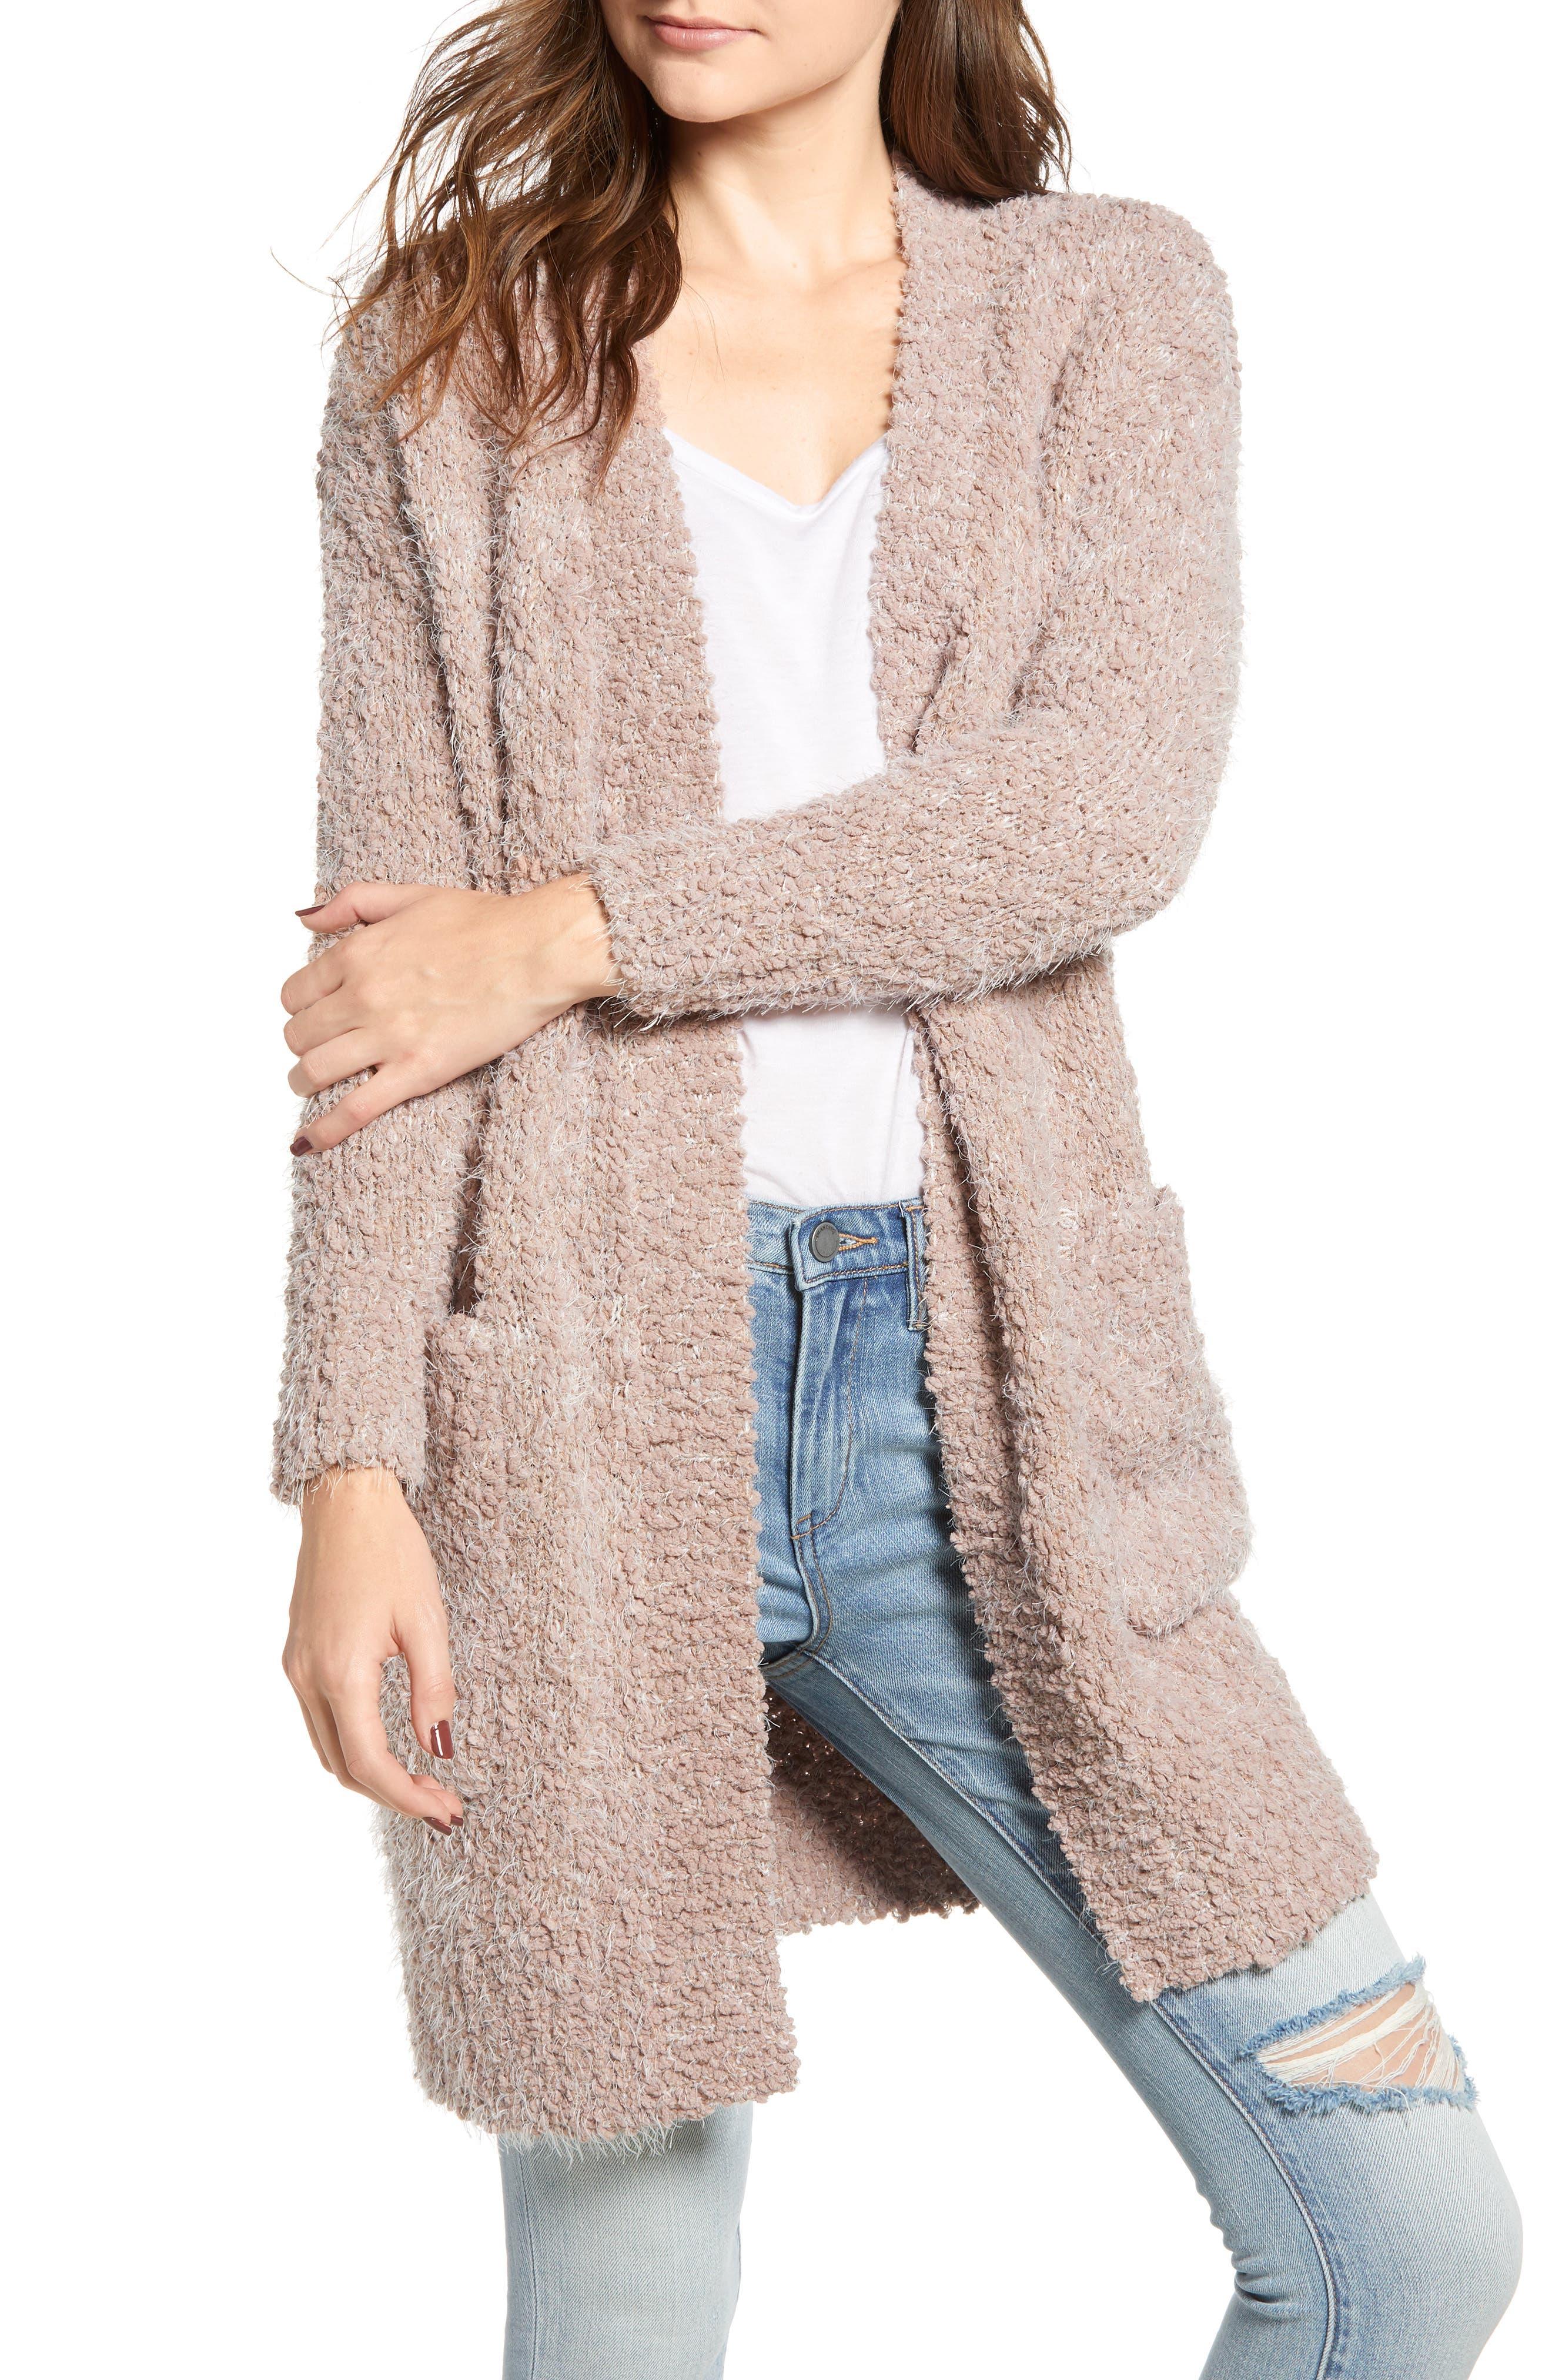 LIRA CLOTHING Miranda Knit Cardigan, Main, color, DUSTY ROSE